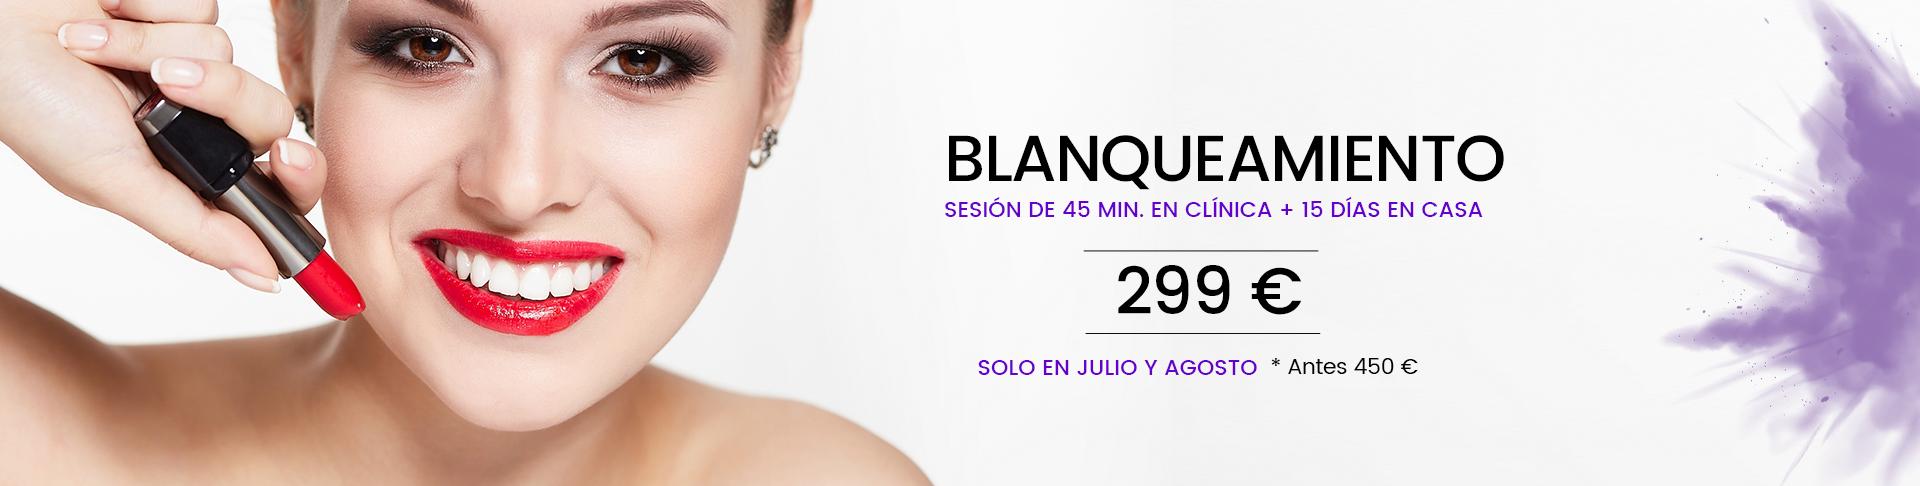 BANNER_BLANQUEAMIENTO